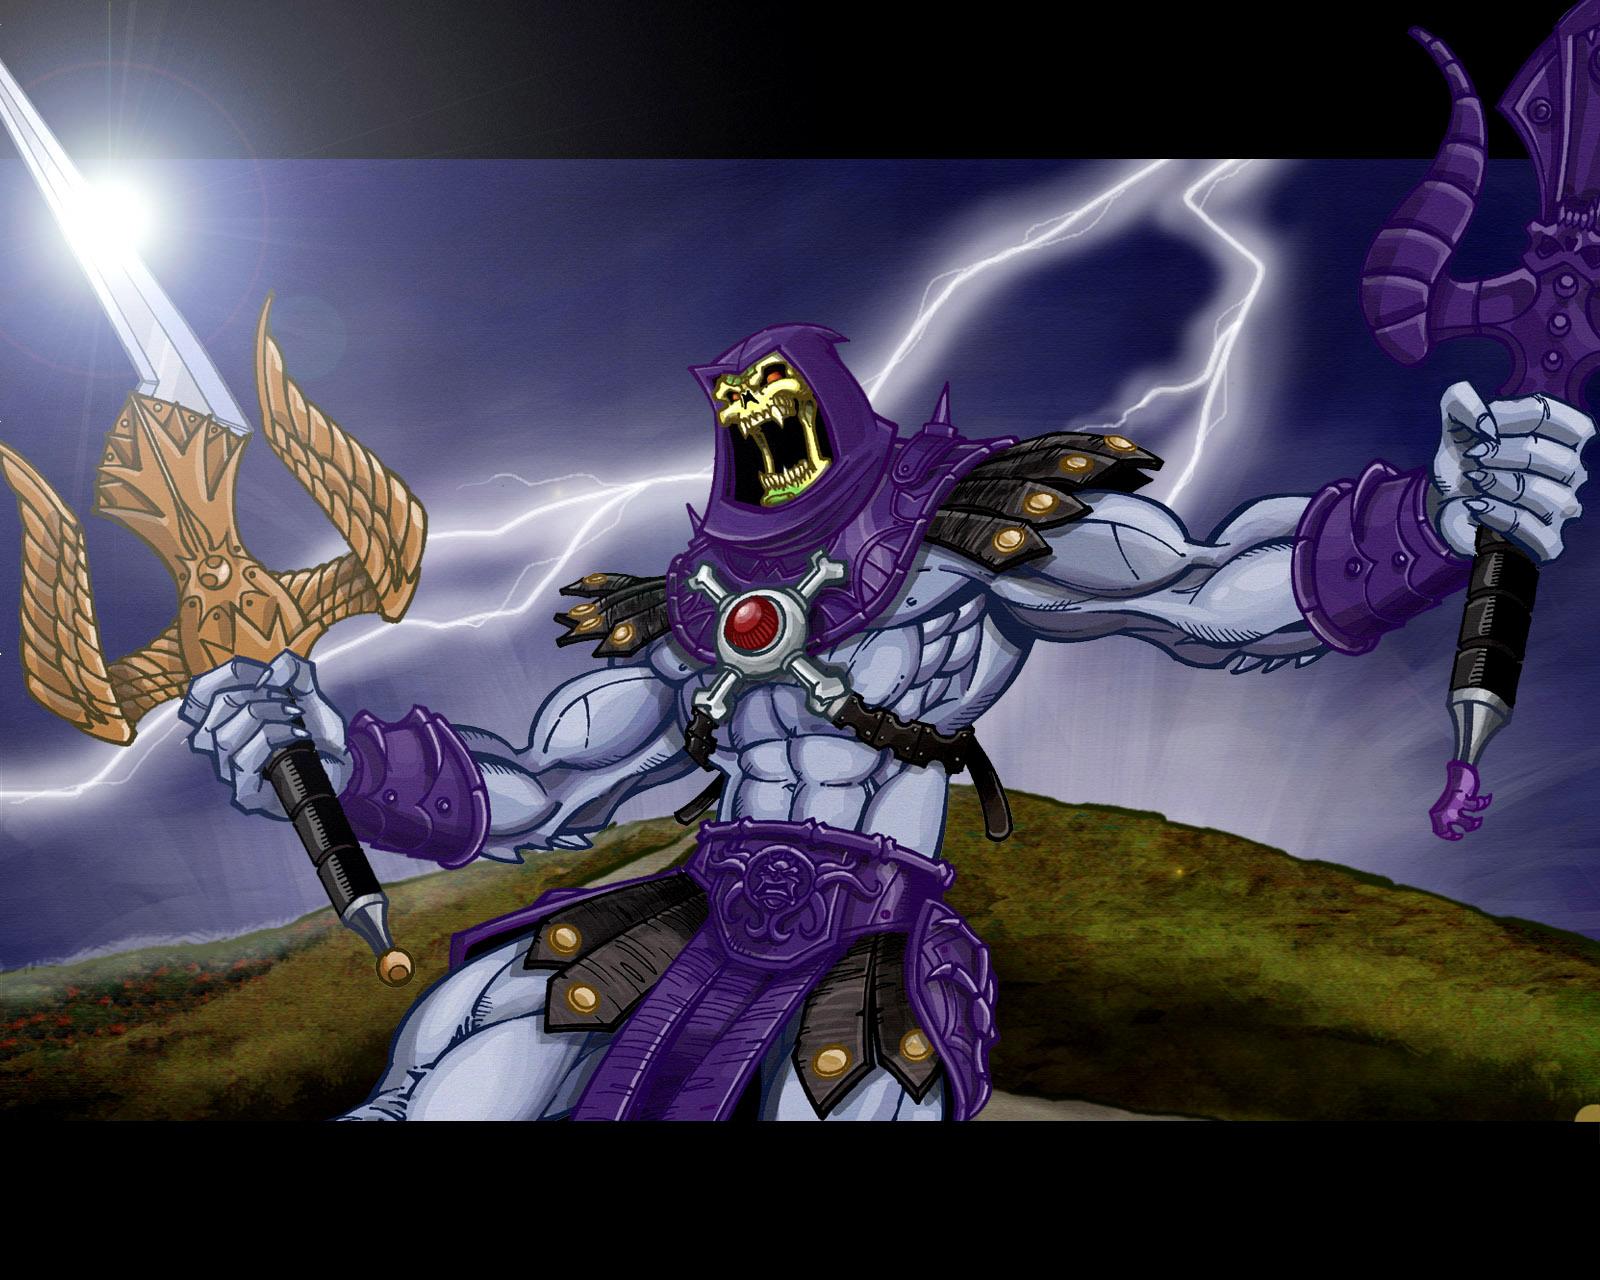 he man wallpaper hd,fictional character,action adventure game,games,illustration,cg artwork